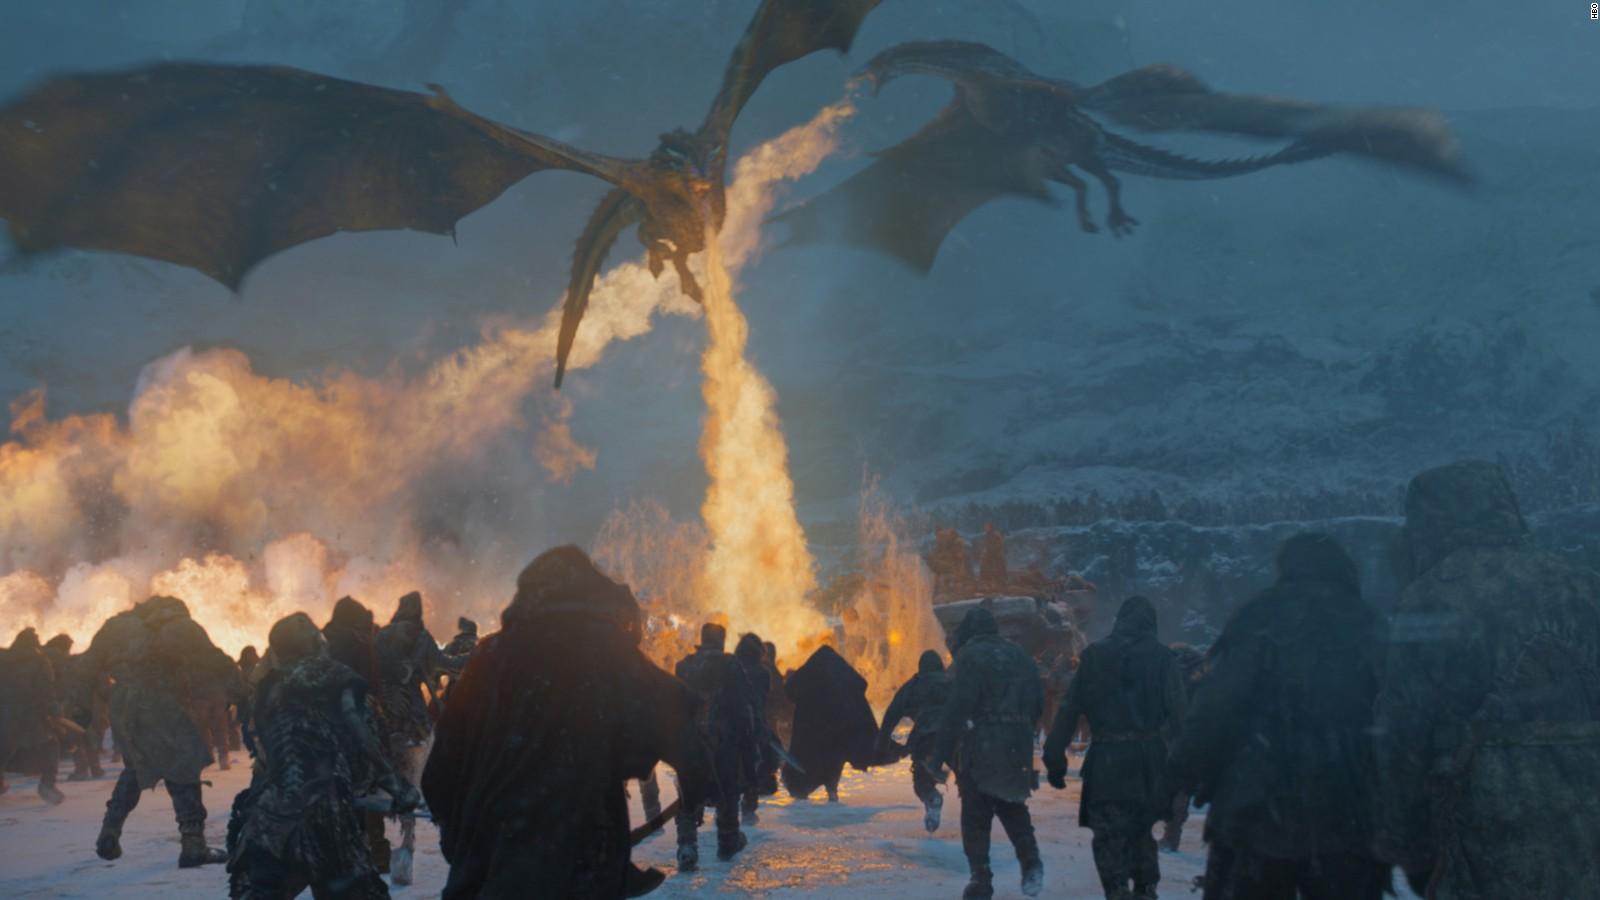 Game Of Thrones Dragons - White Walker Kills Dragon - HD Wallpaper